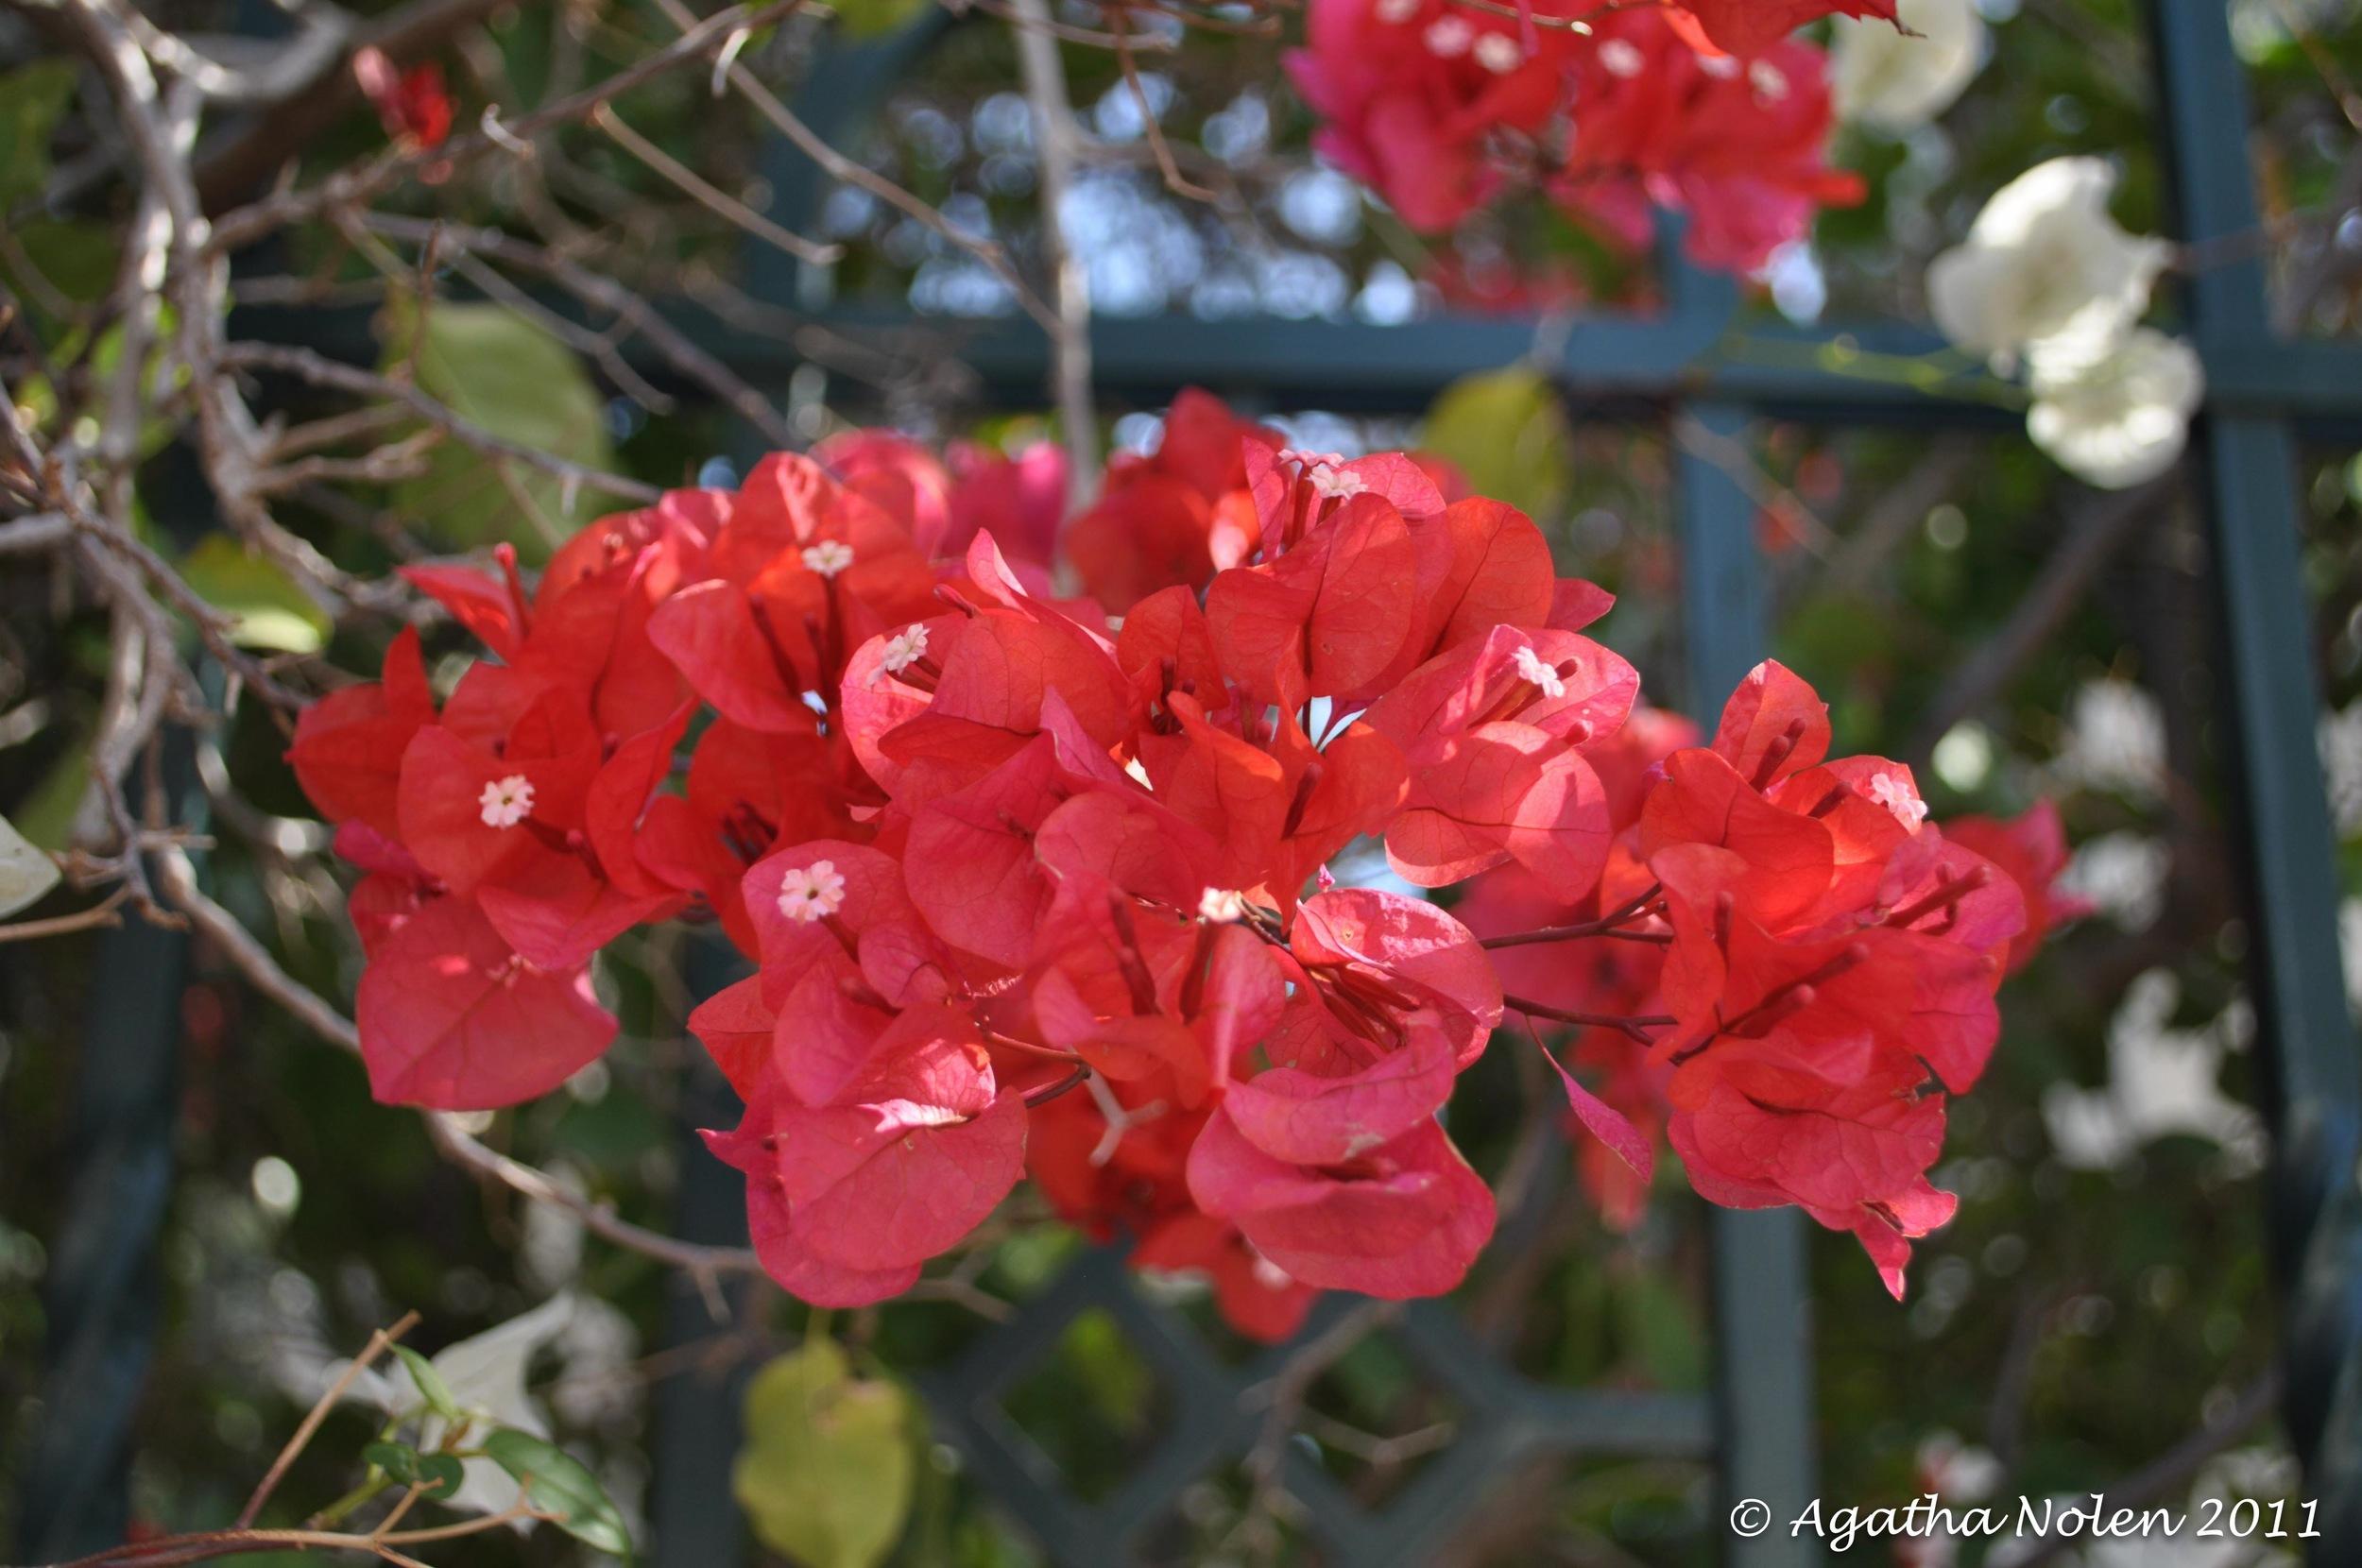 Flower, Mount of Beatitudes, Israel, 2011